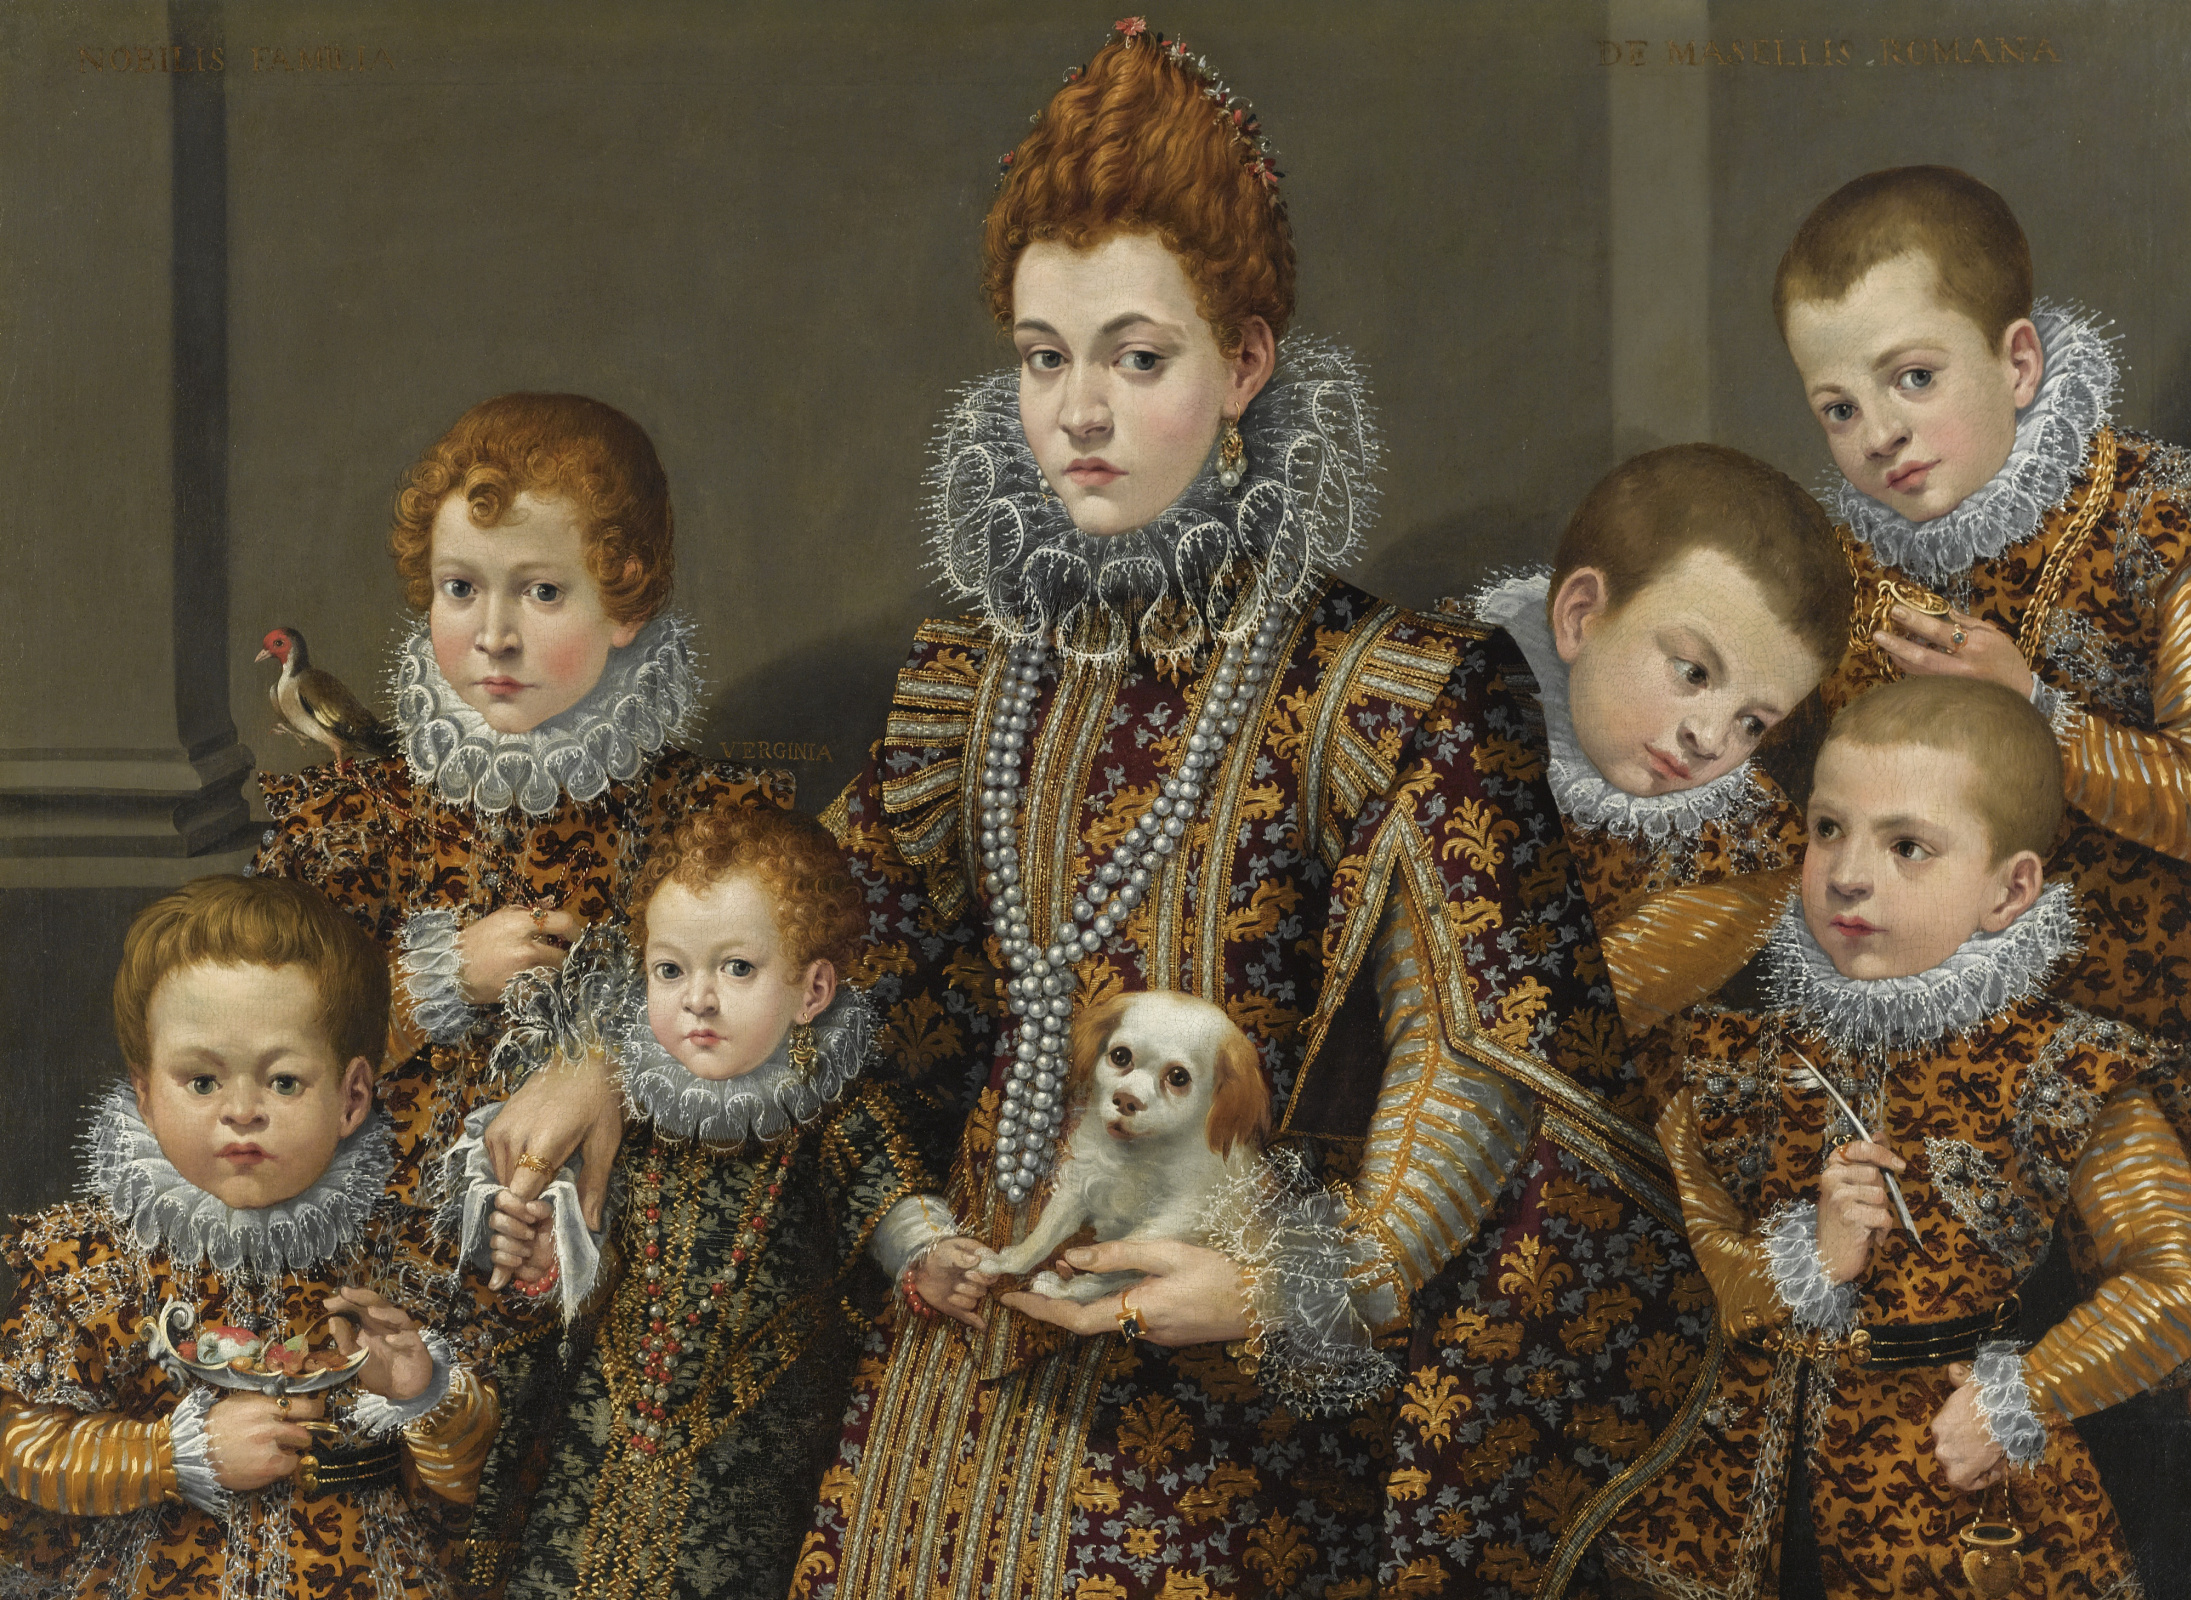 Лавиния Фонтана. Бьянка дели Утили Мазелли и её шестеро детей